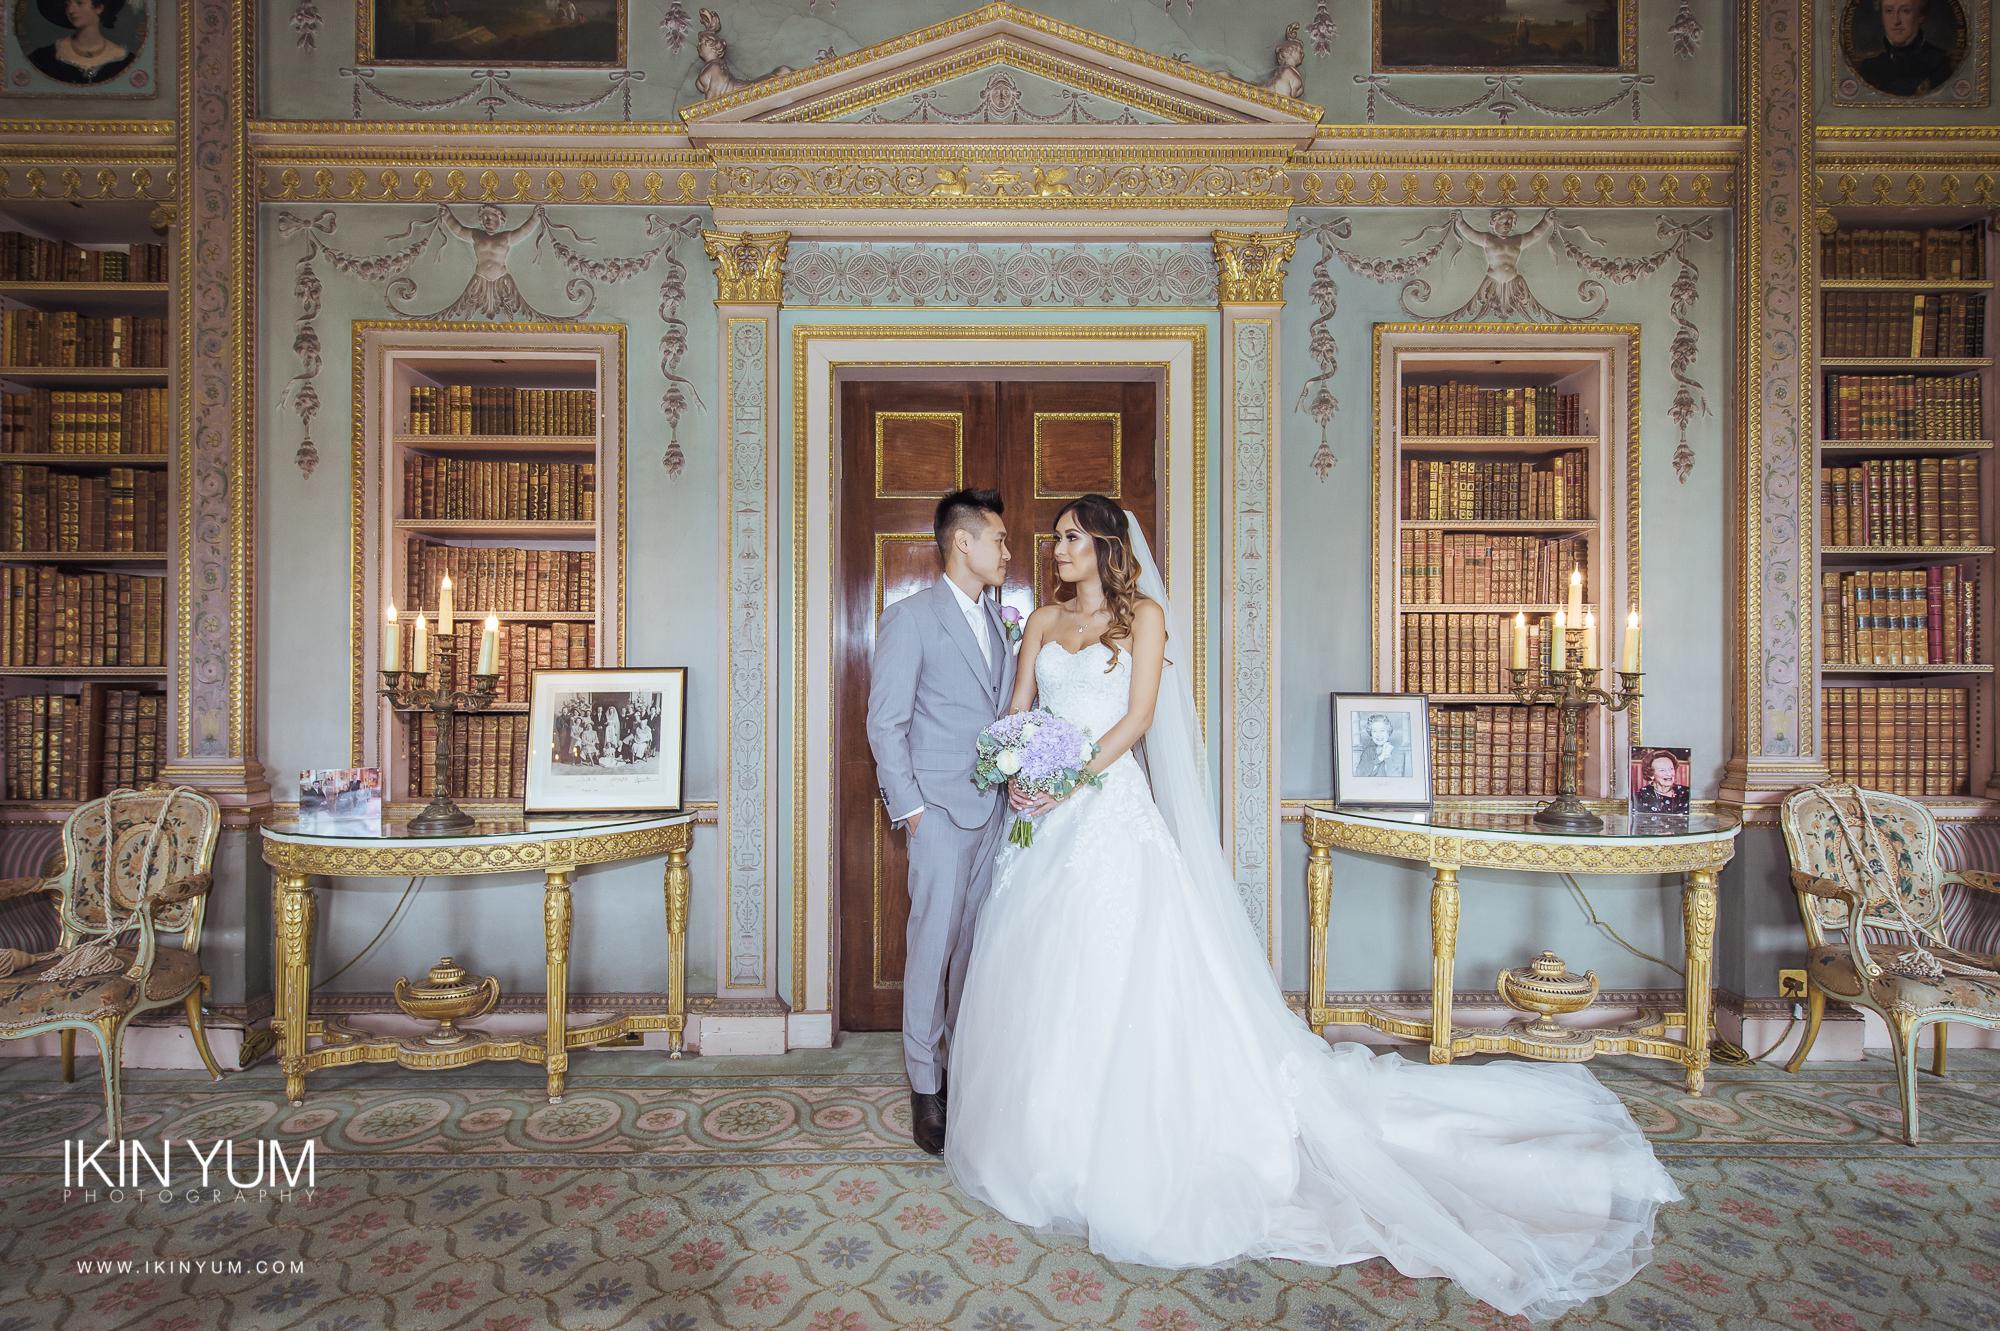 Syon Park Wedding - Ikin Yum Photography -077.jpg